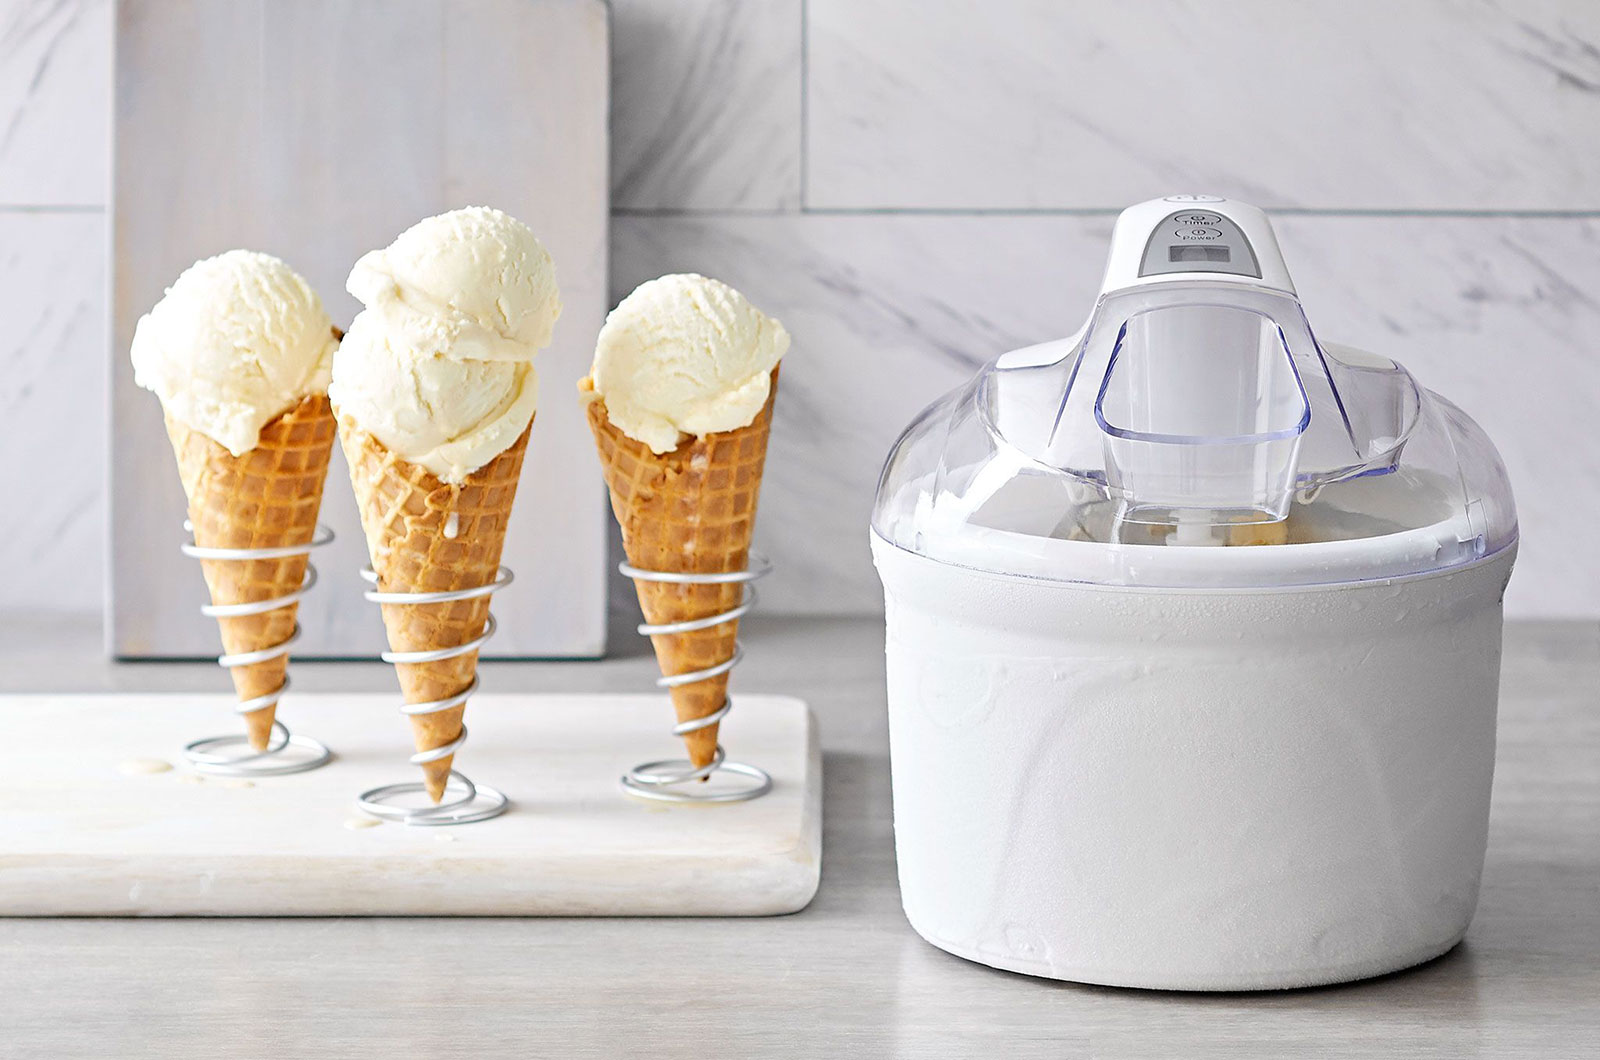 Best Ice Cream Maker with Compressor